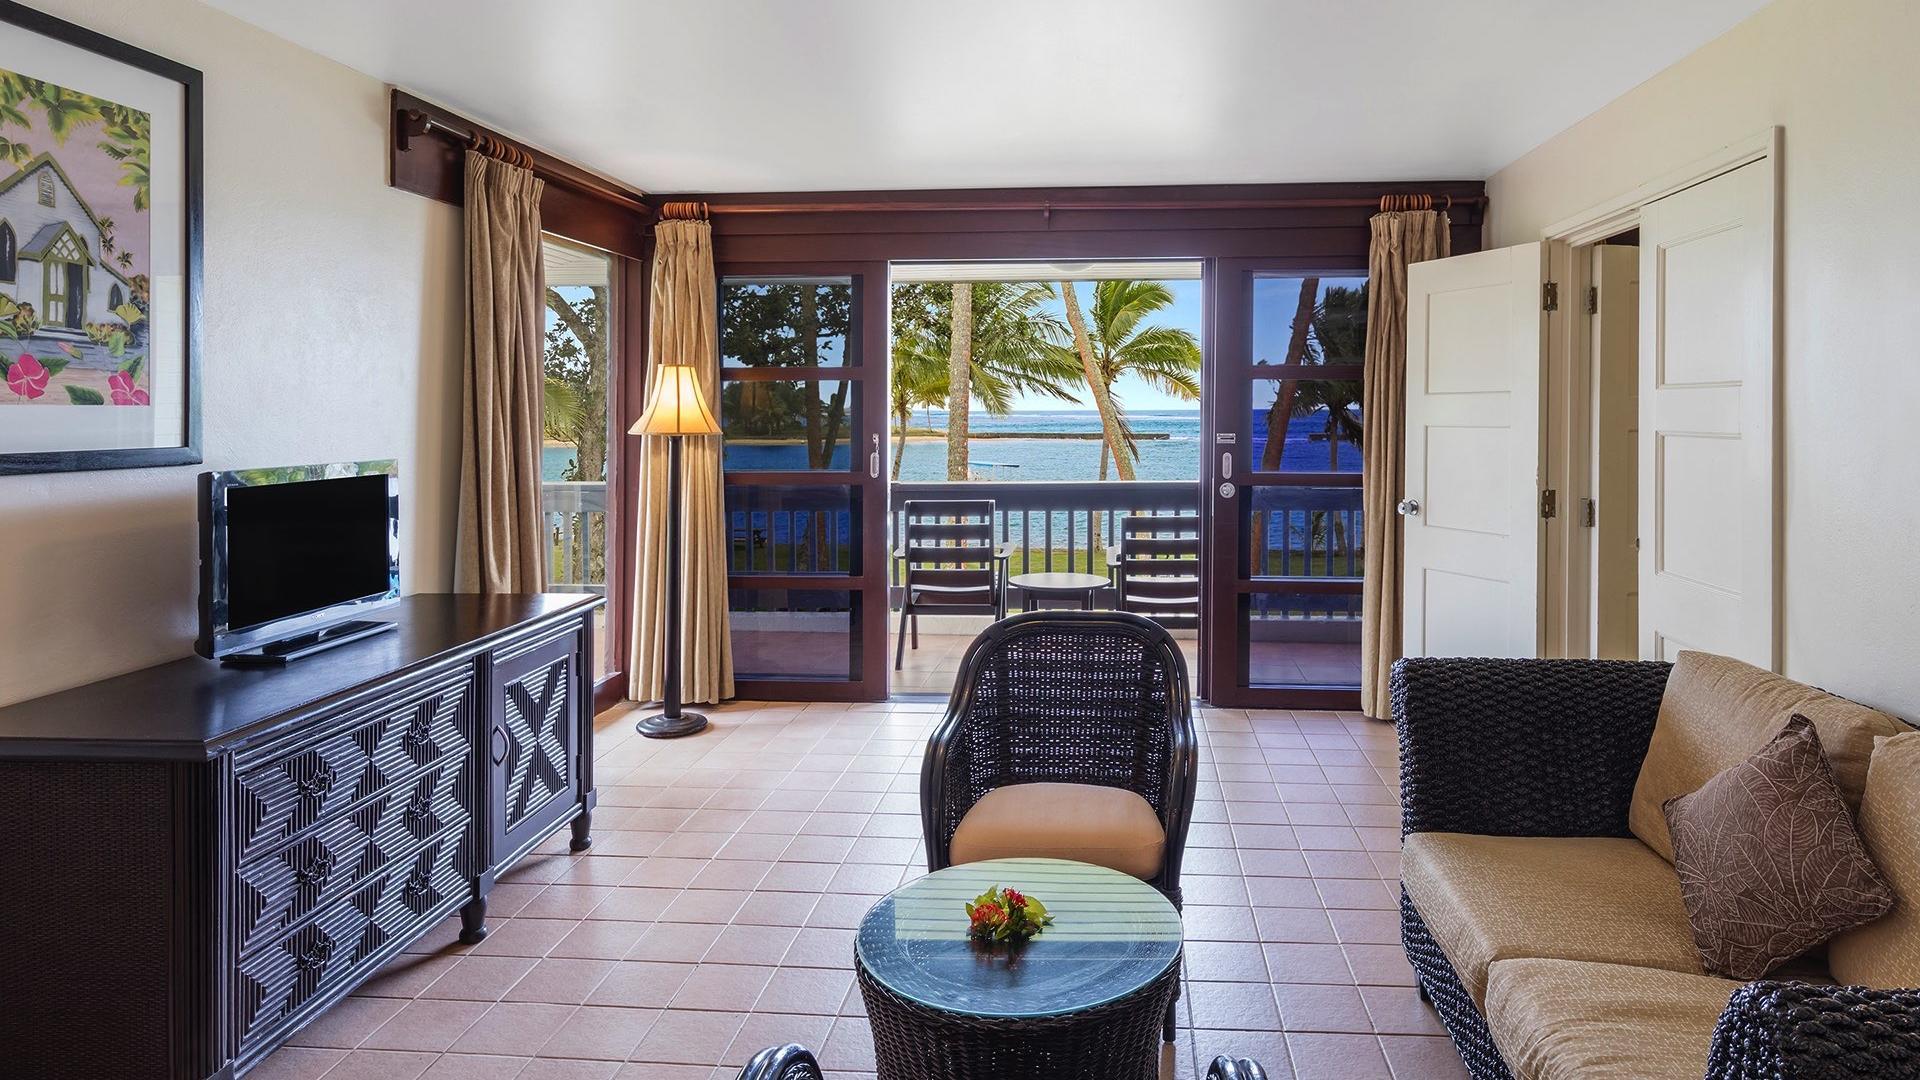 Studio Villa offer details